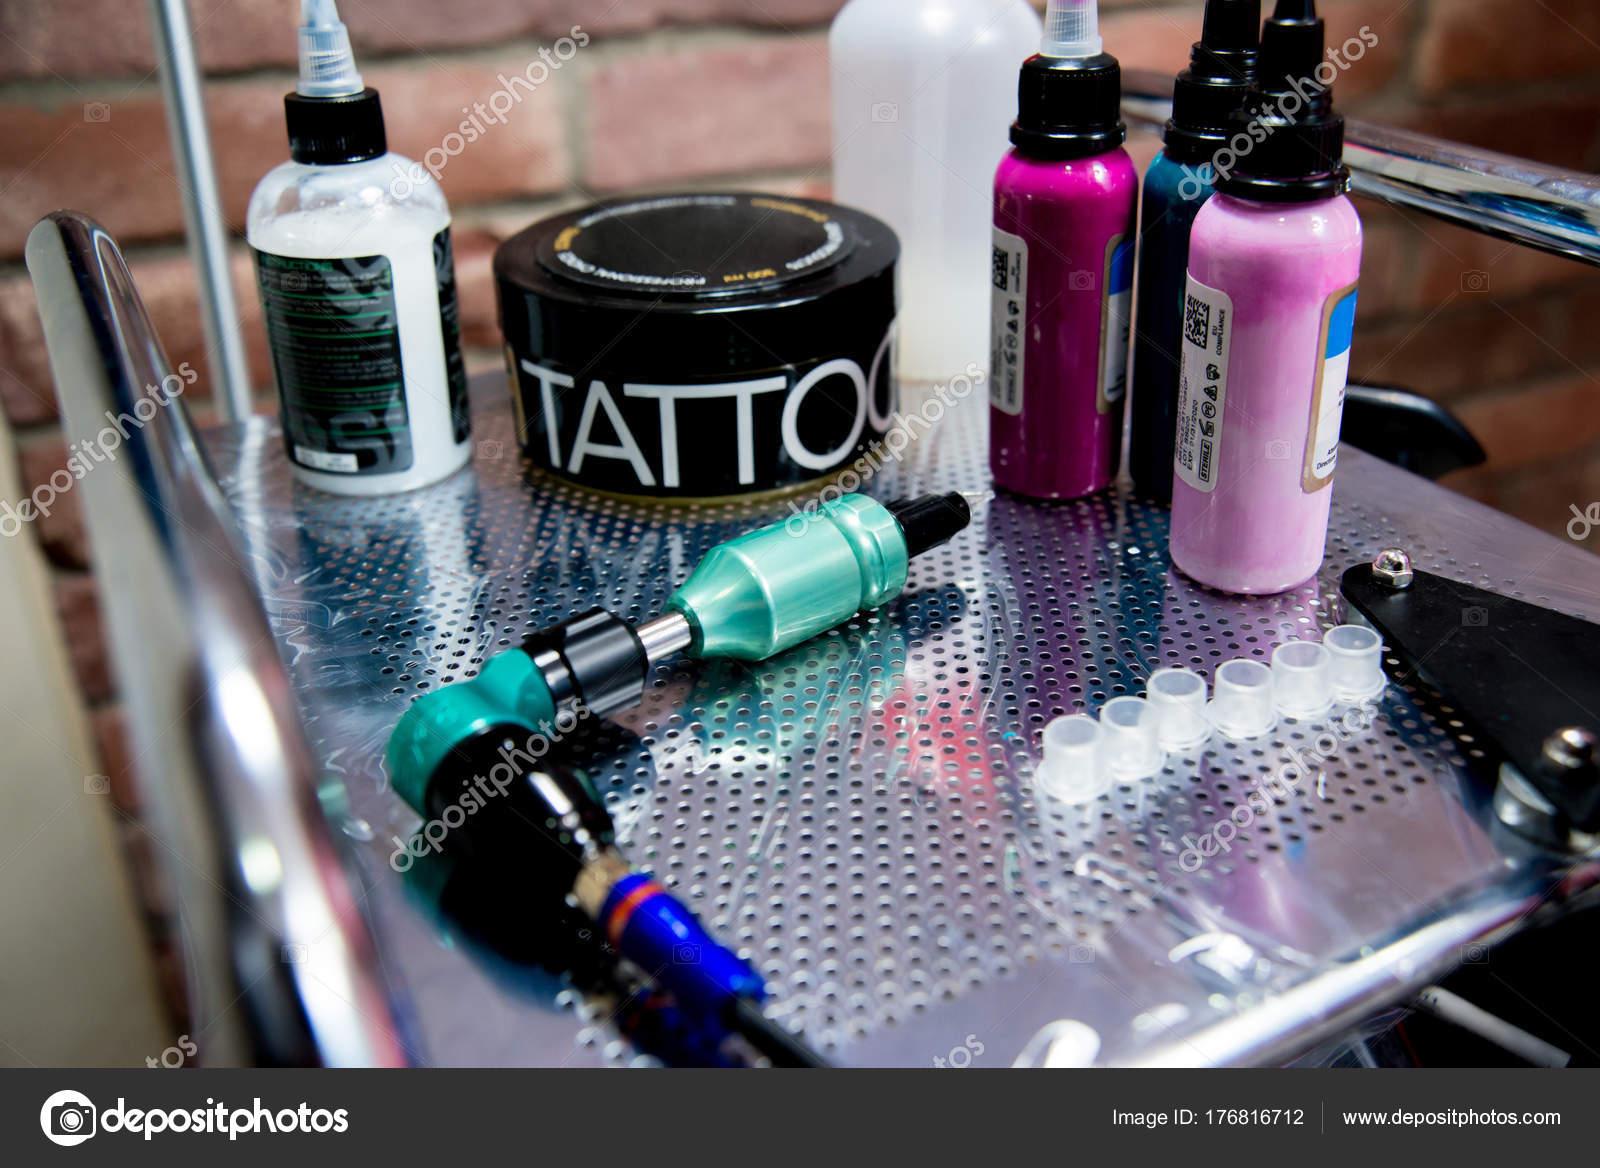 Tattoo Accessories Equipment Tattoo Studio Close — Stock Photo ...